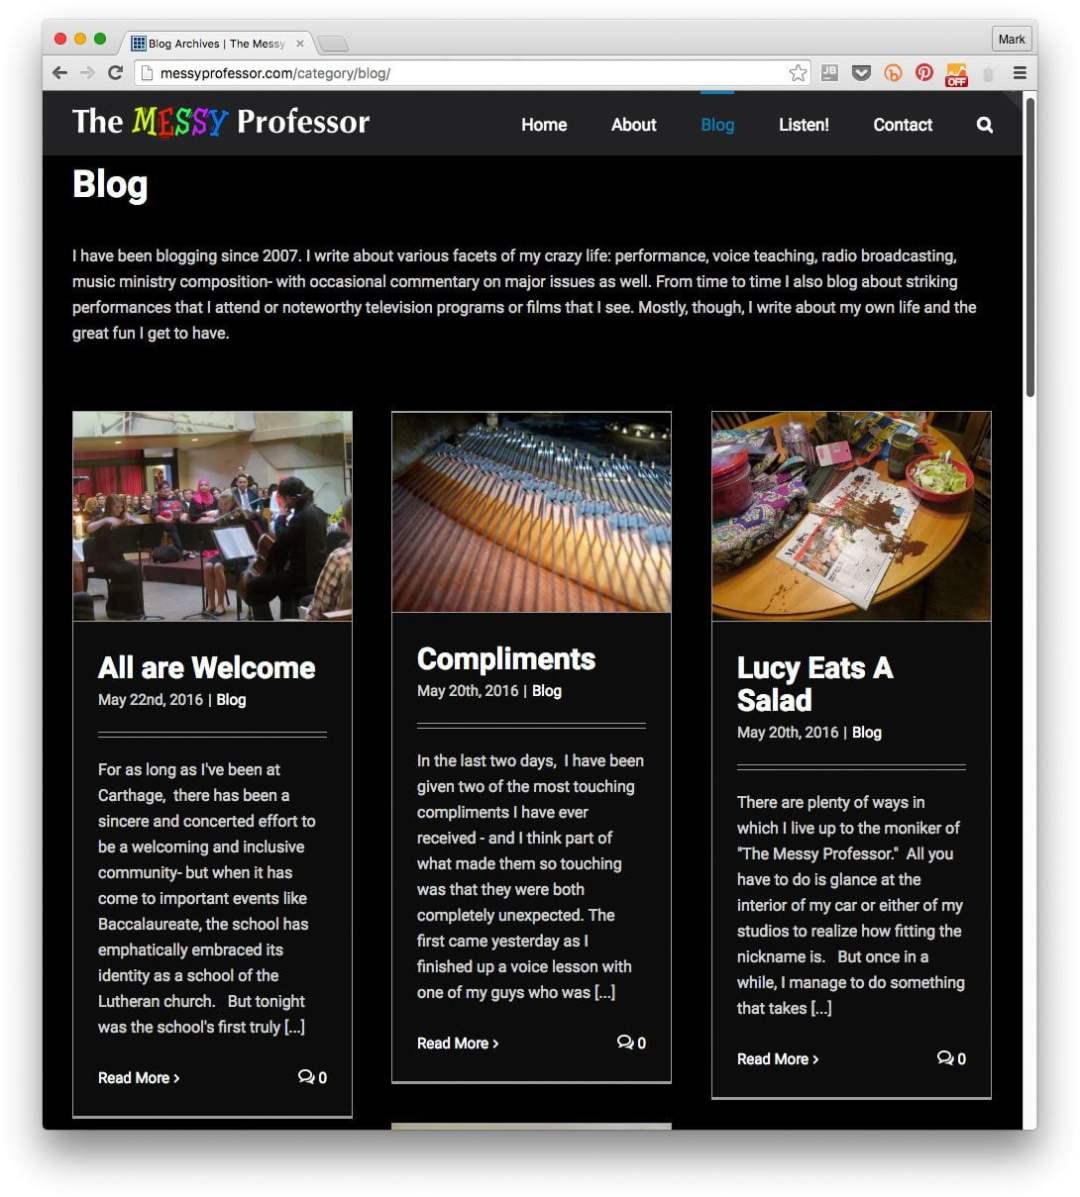 Website example: Gregory Berg's blog The Messy Professor